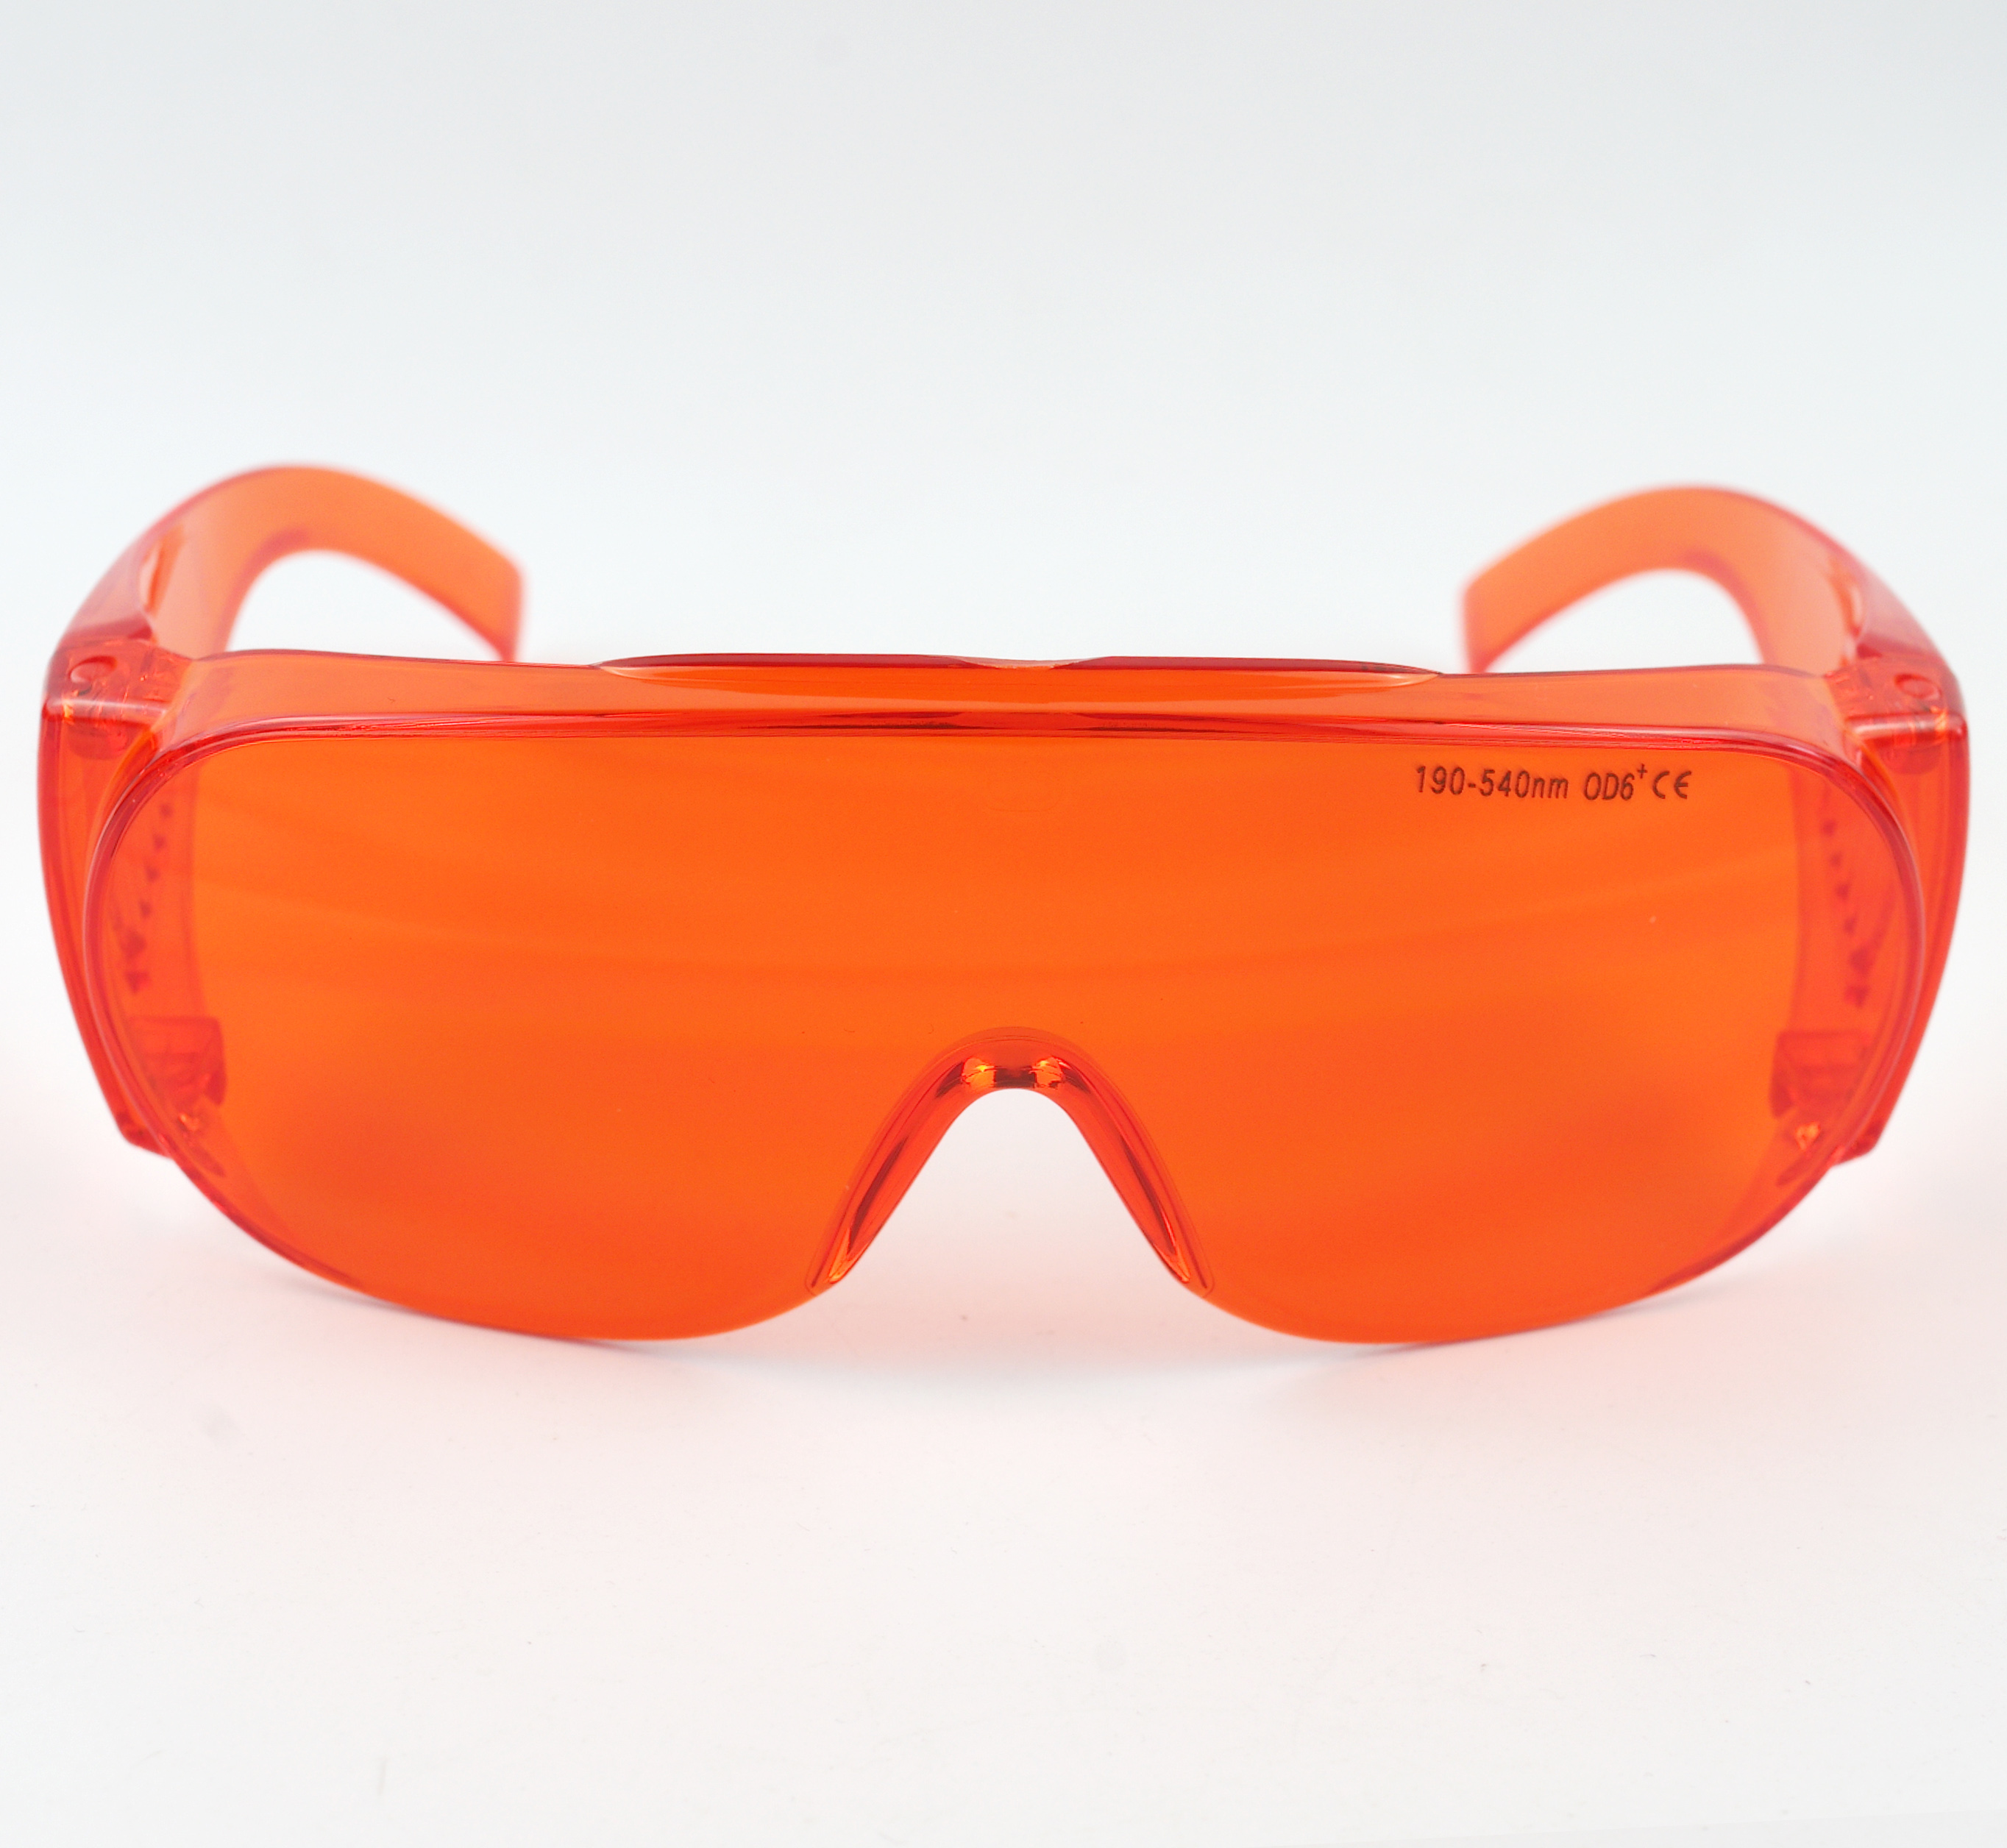 EP-3-6 Laser Occhiali di Protezione Occhiali 200-540nm appositamente per 532nm Verde Occhiali Occhiali di Sicurezza OD6 + CE Standard